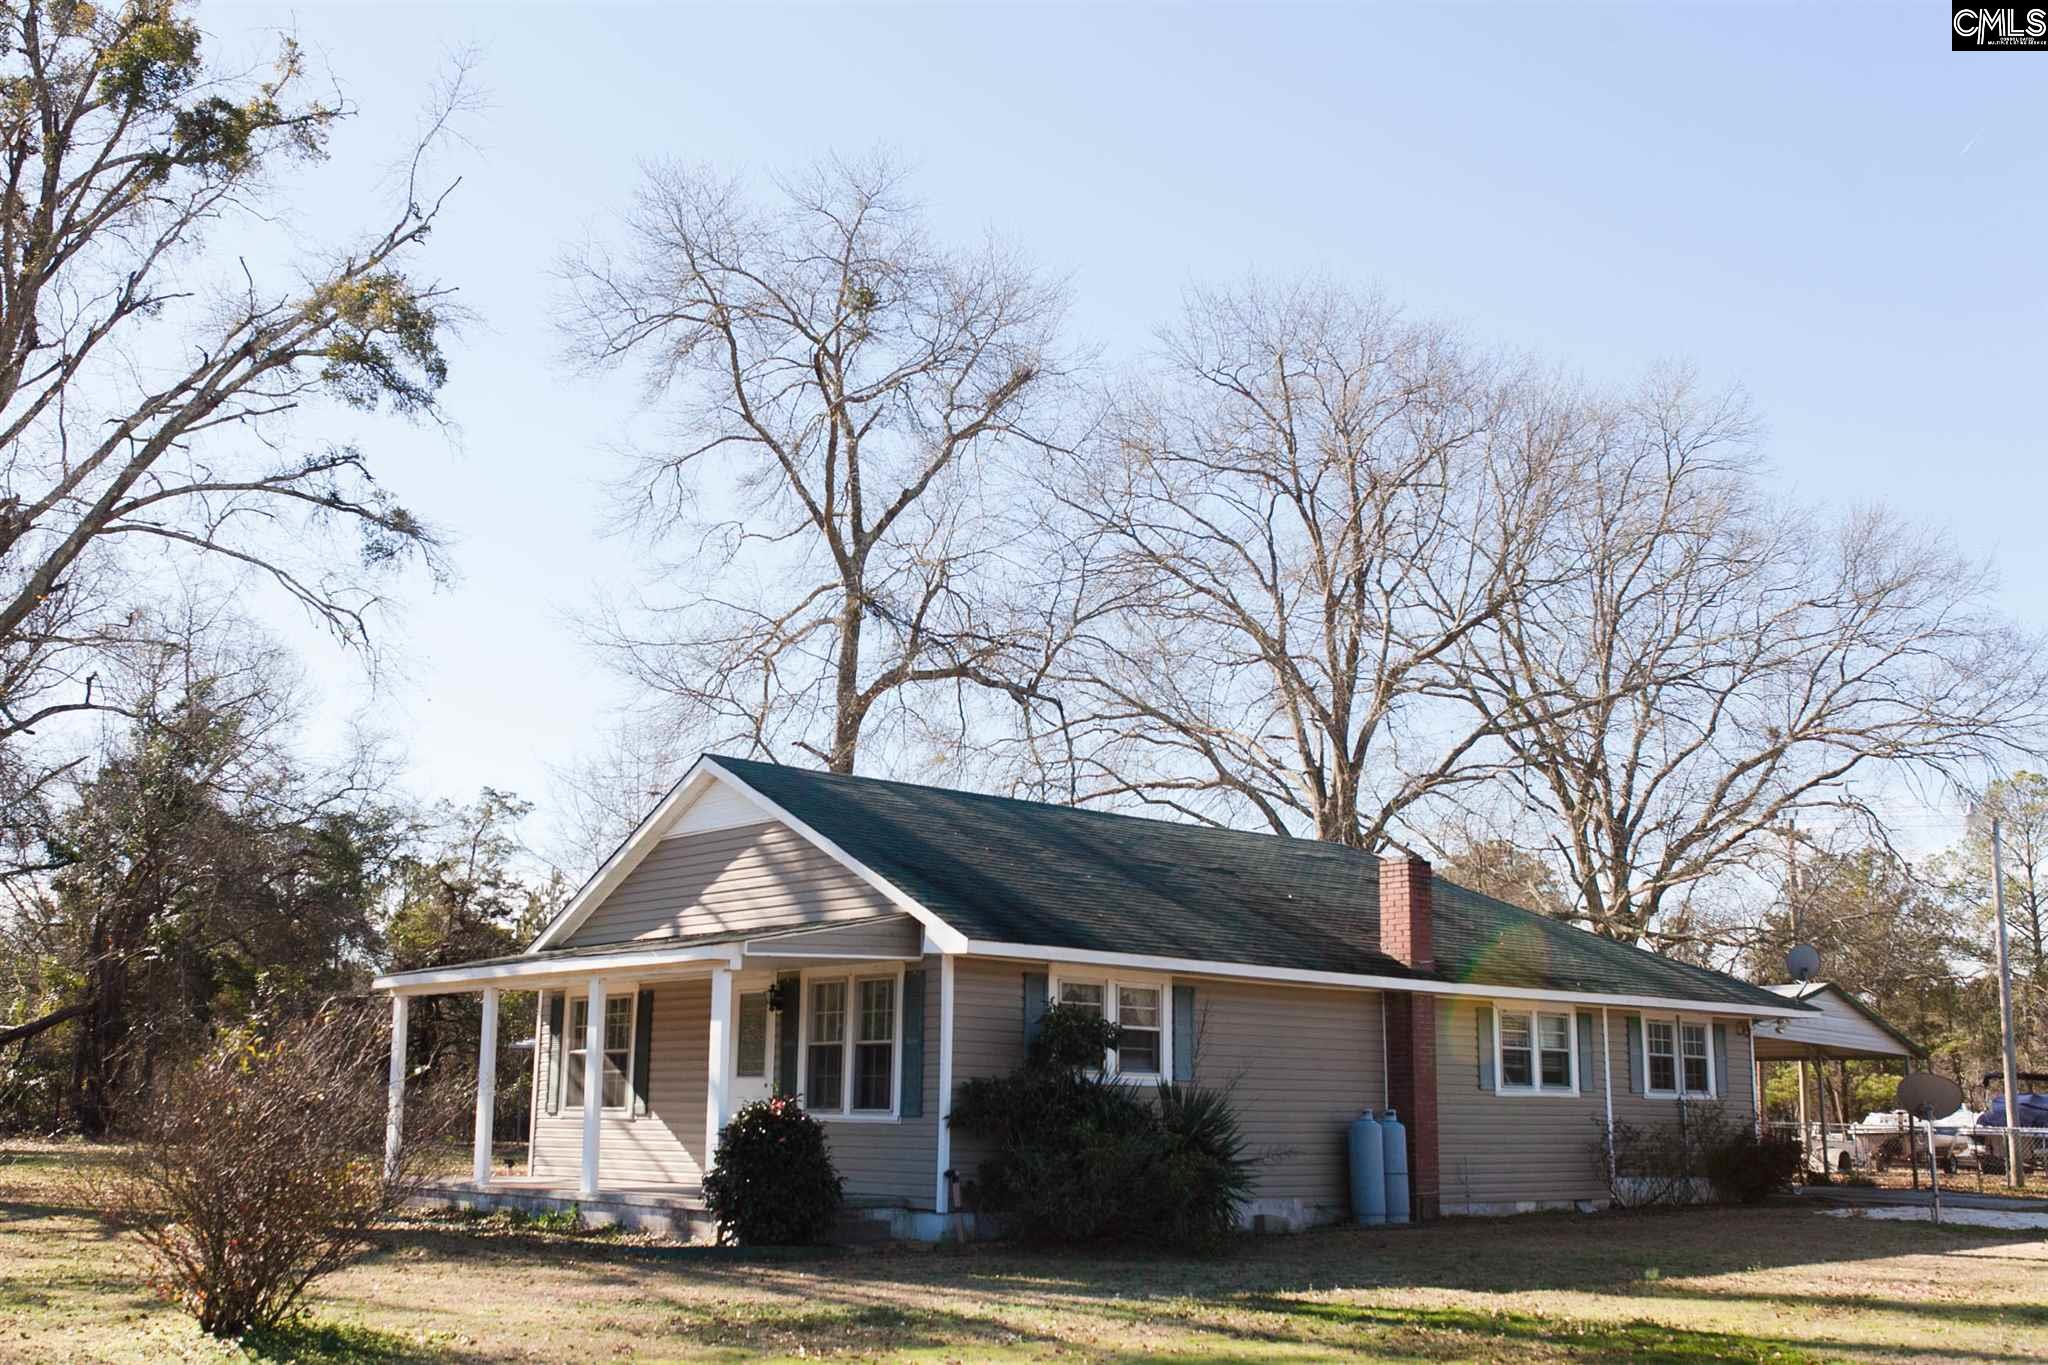 911 Pine Grove Lugoff, SC 29078-9655